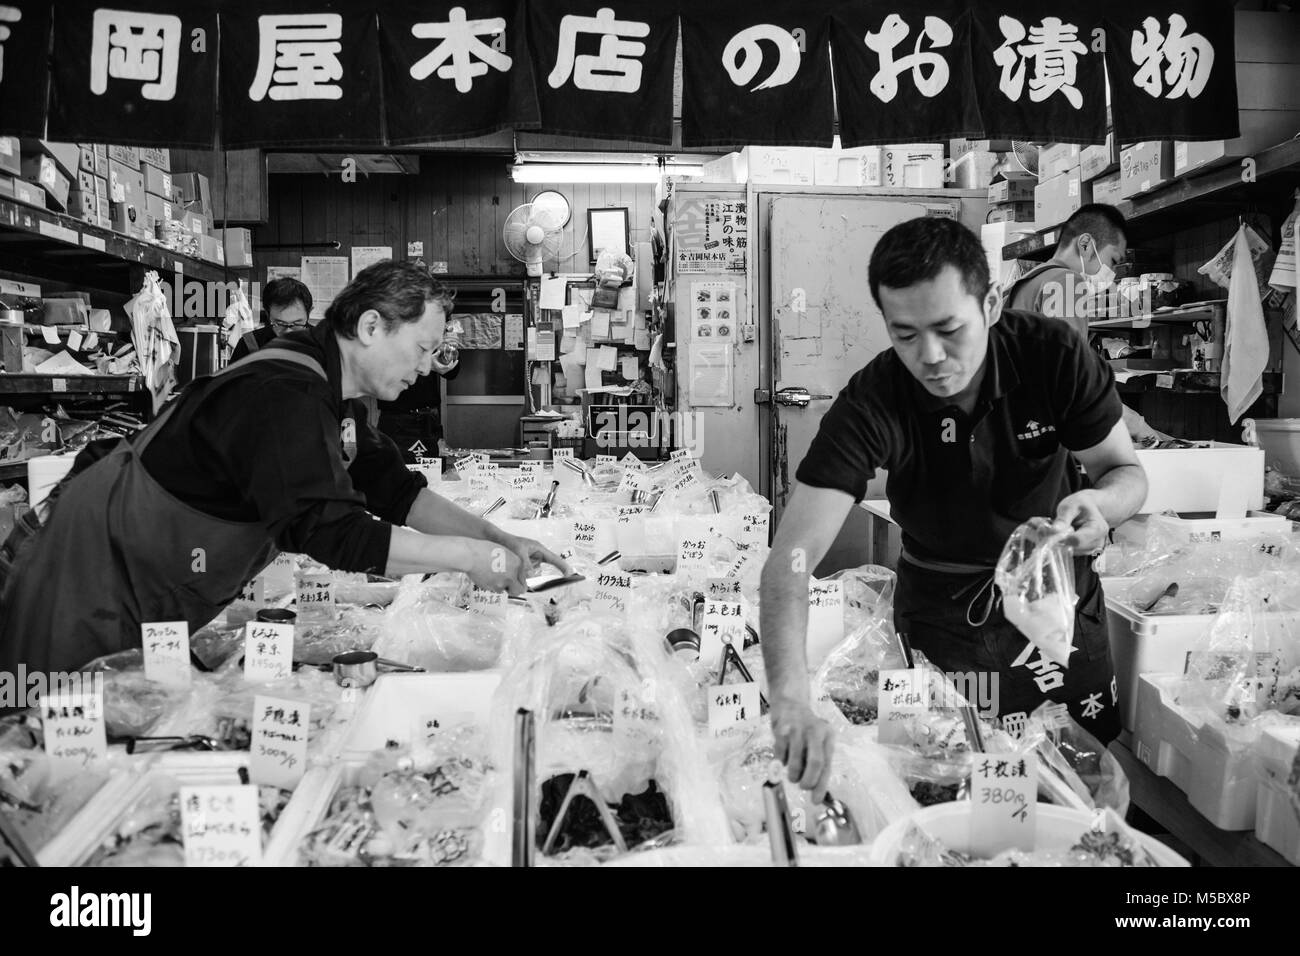 Market vendors black and white stock photos images alamy for Tsukiji fish market chicago